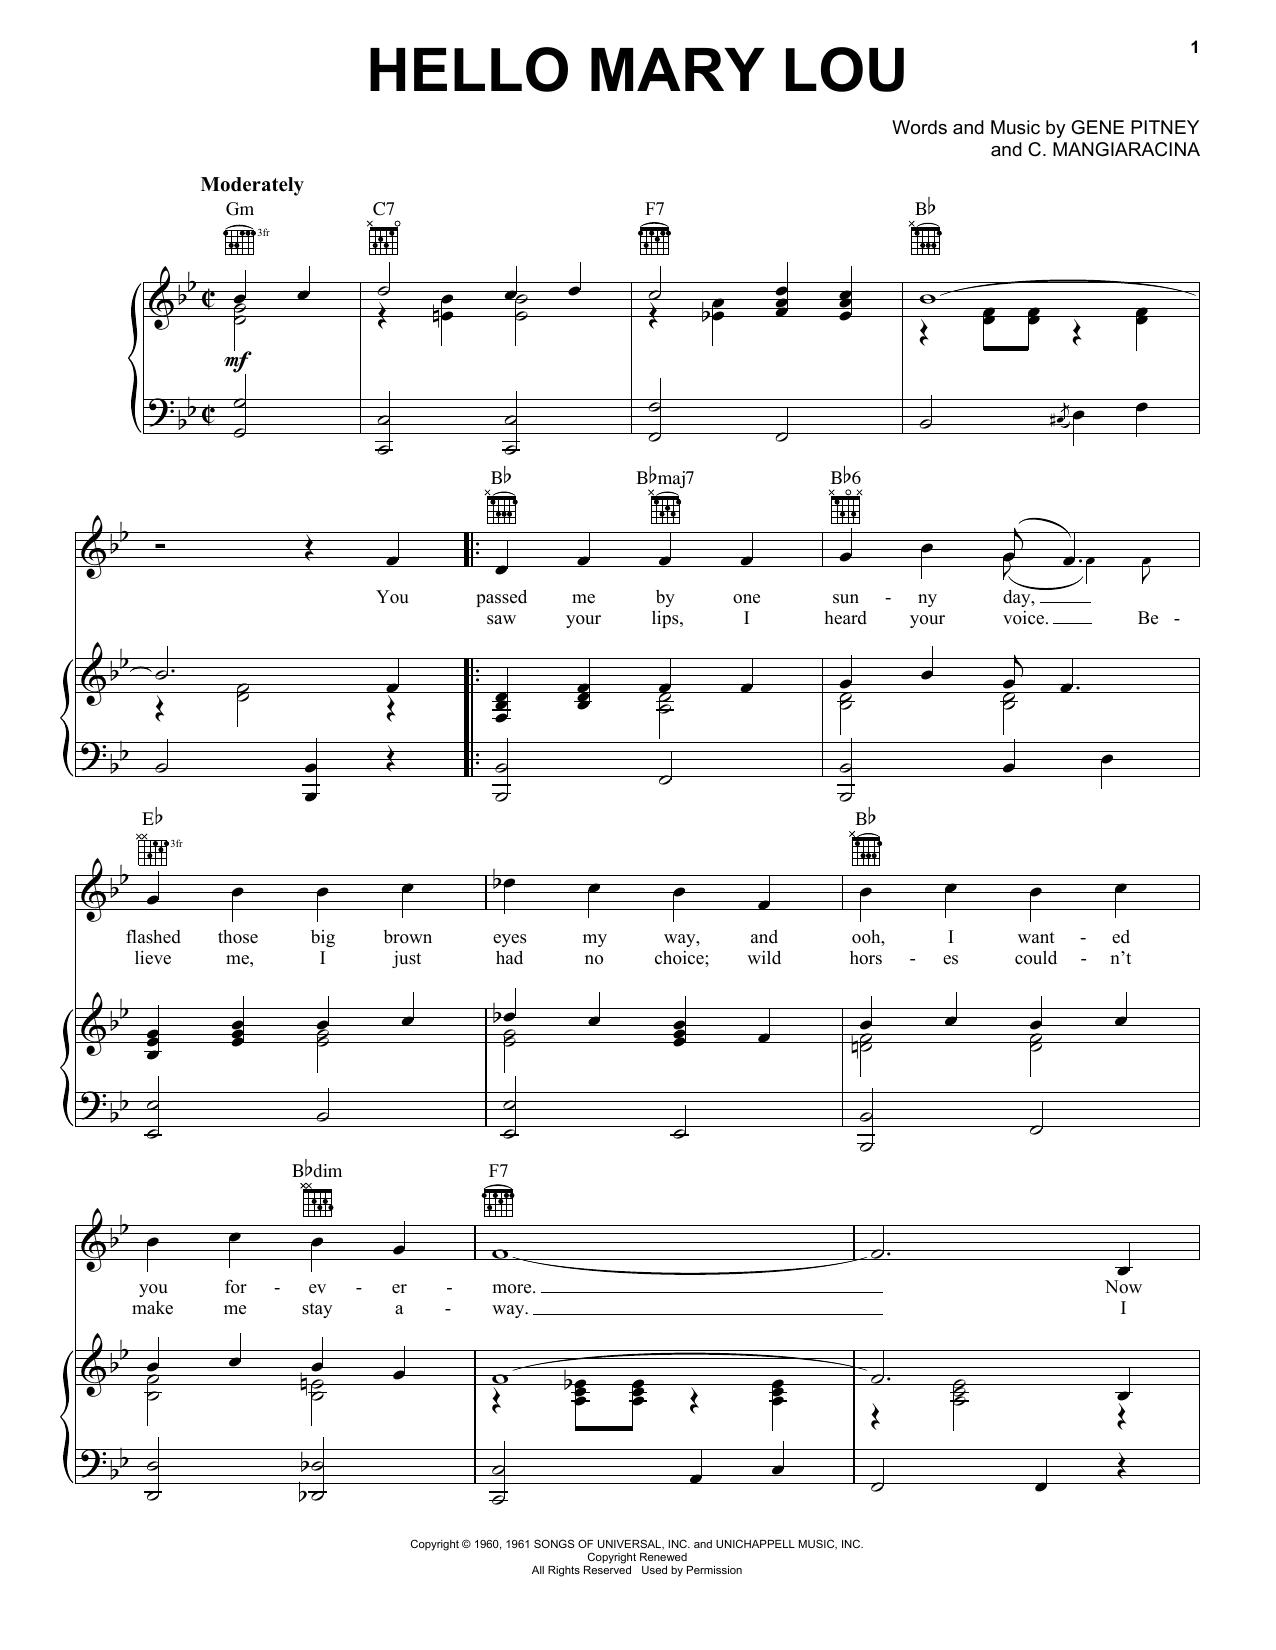 Sheet Music Digital Files To Print Licensed C Mangiaracina